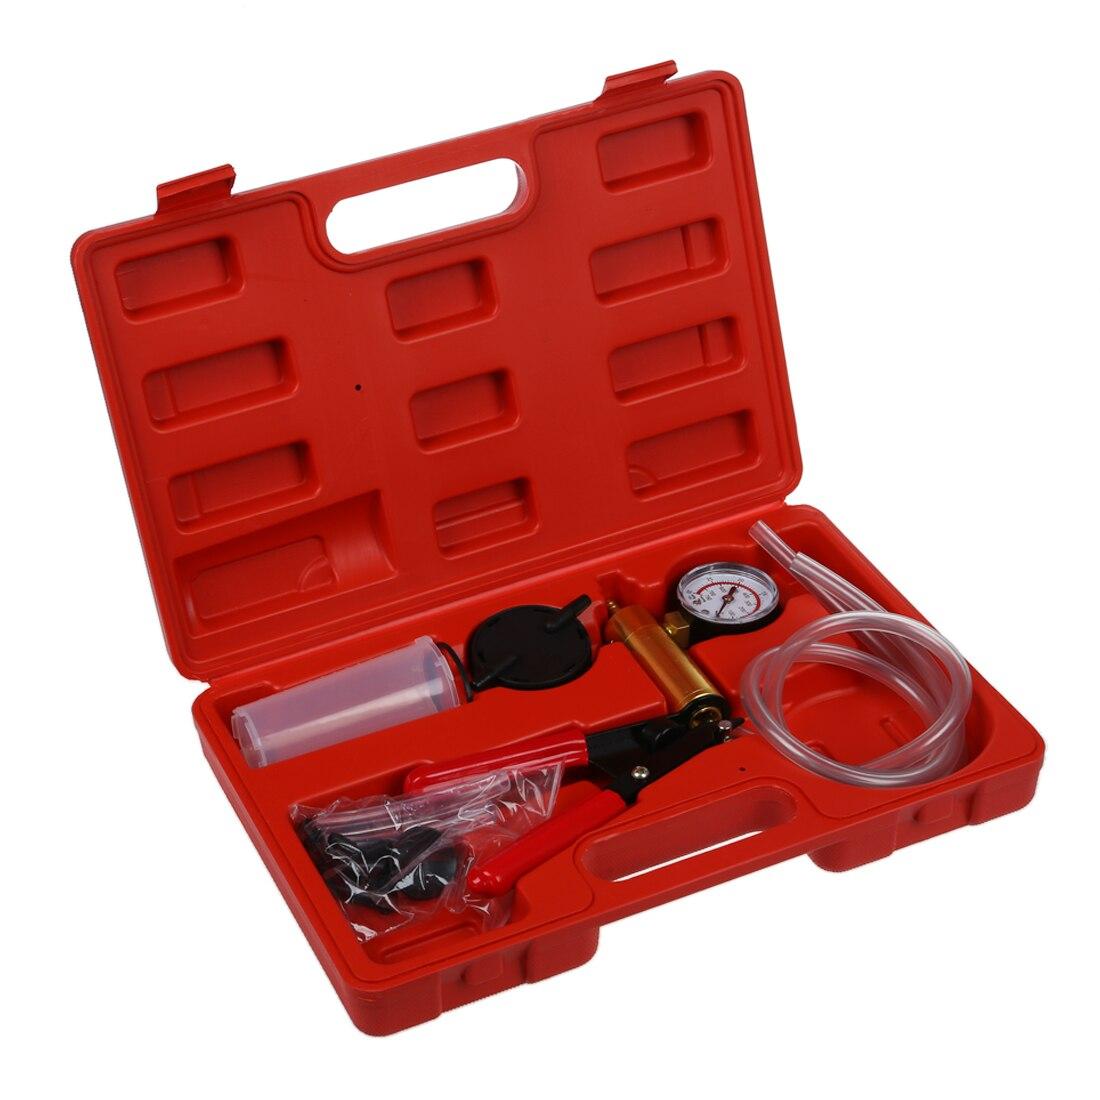 Adaptable Vacuum Tester, Vacuum Pump Kit, Car Tool, Vacuum Testing Tool And Brake Bleeder Catalogues Will Be Sent Upon Request